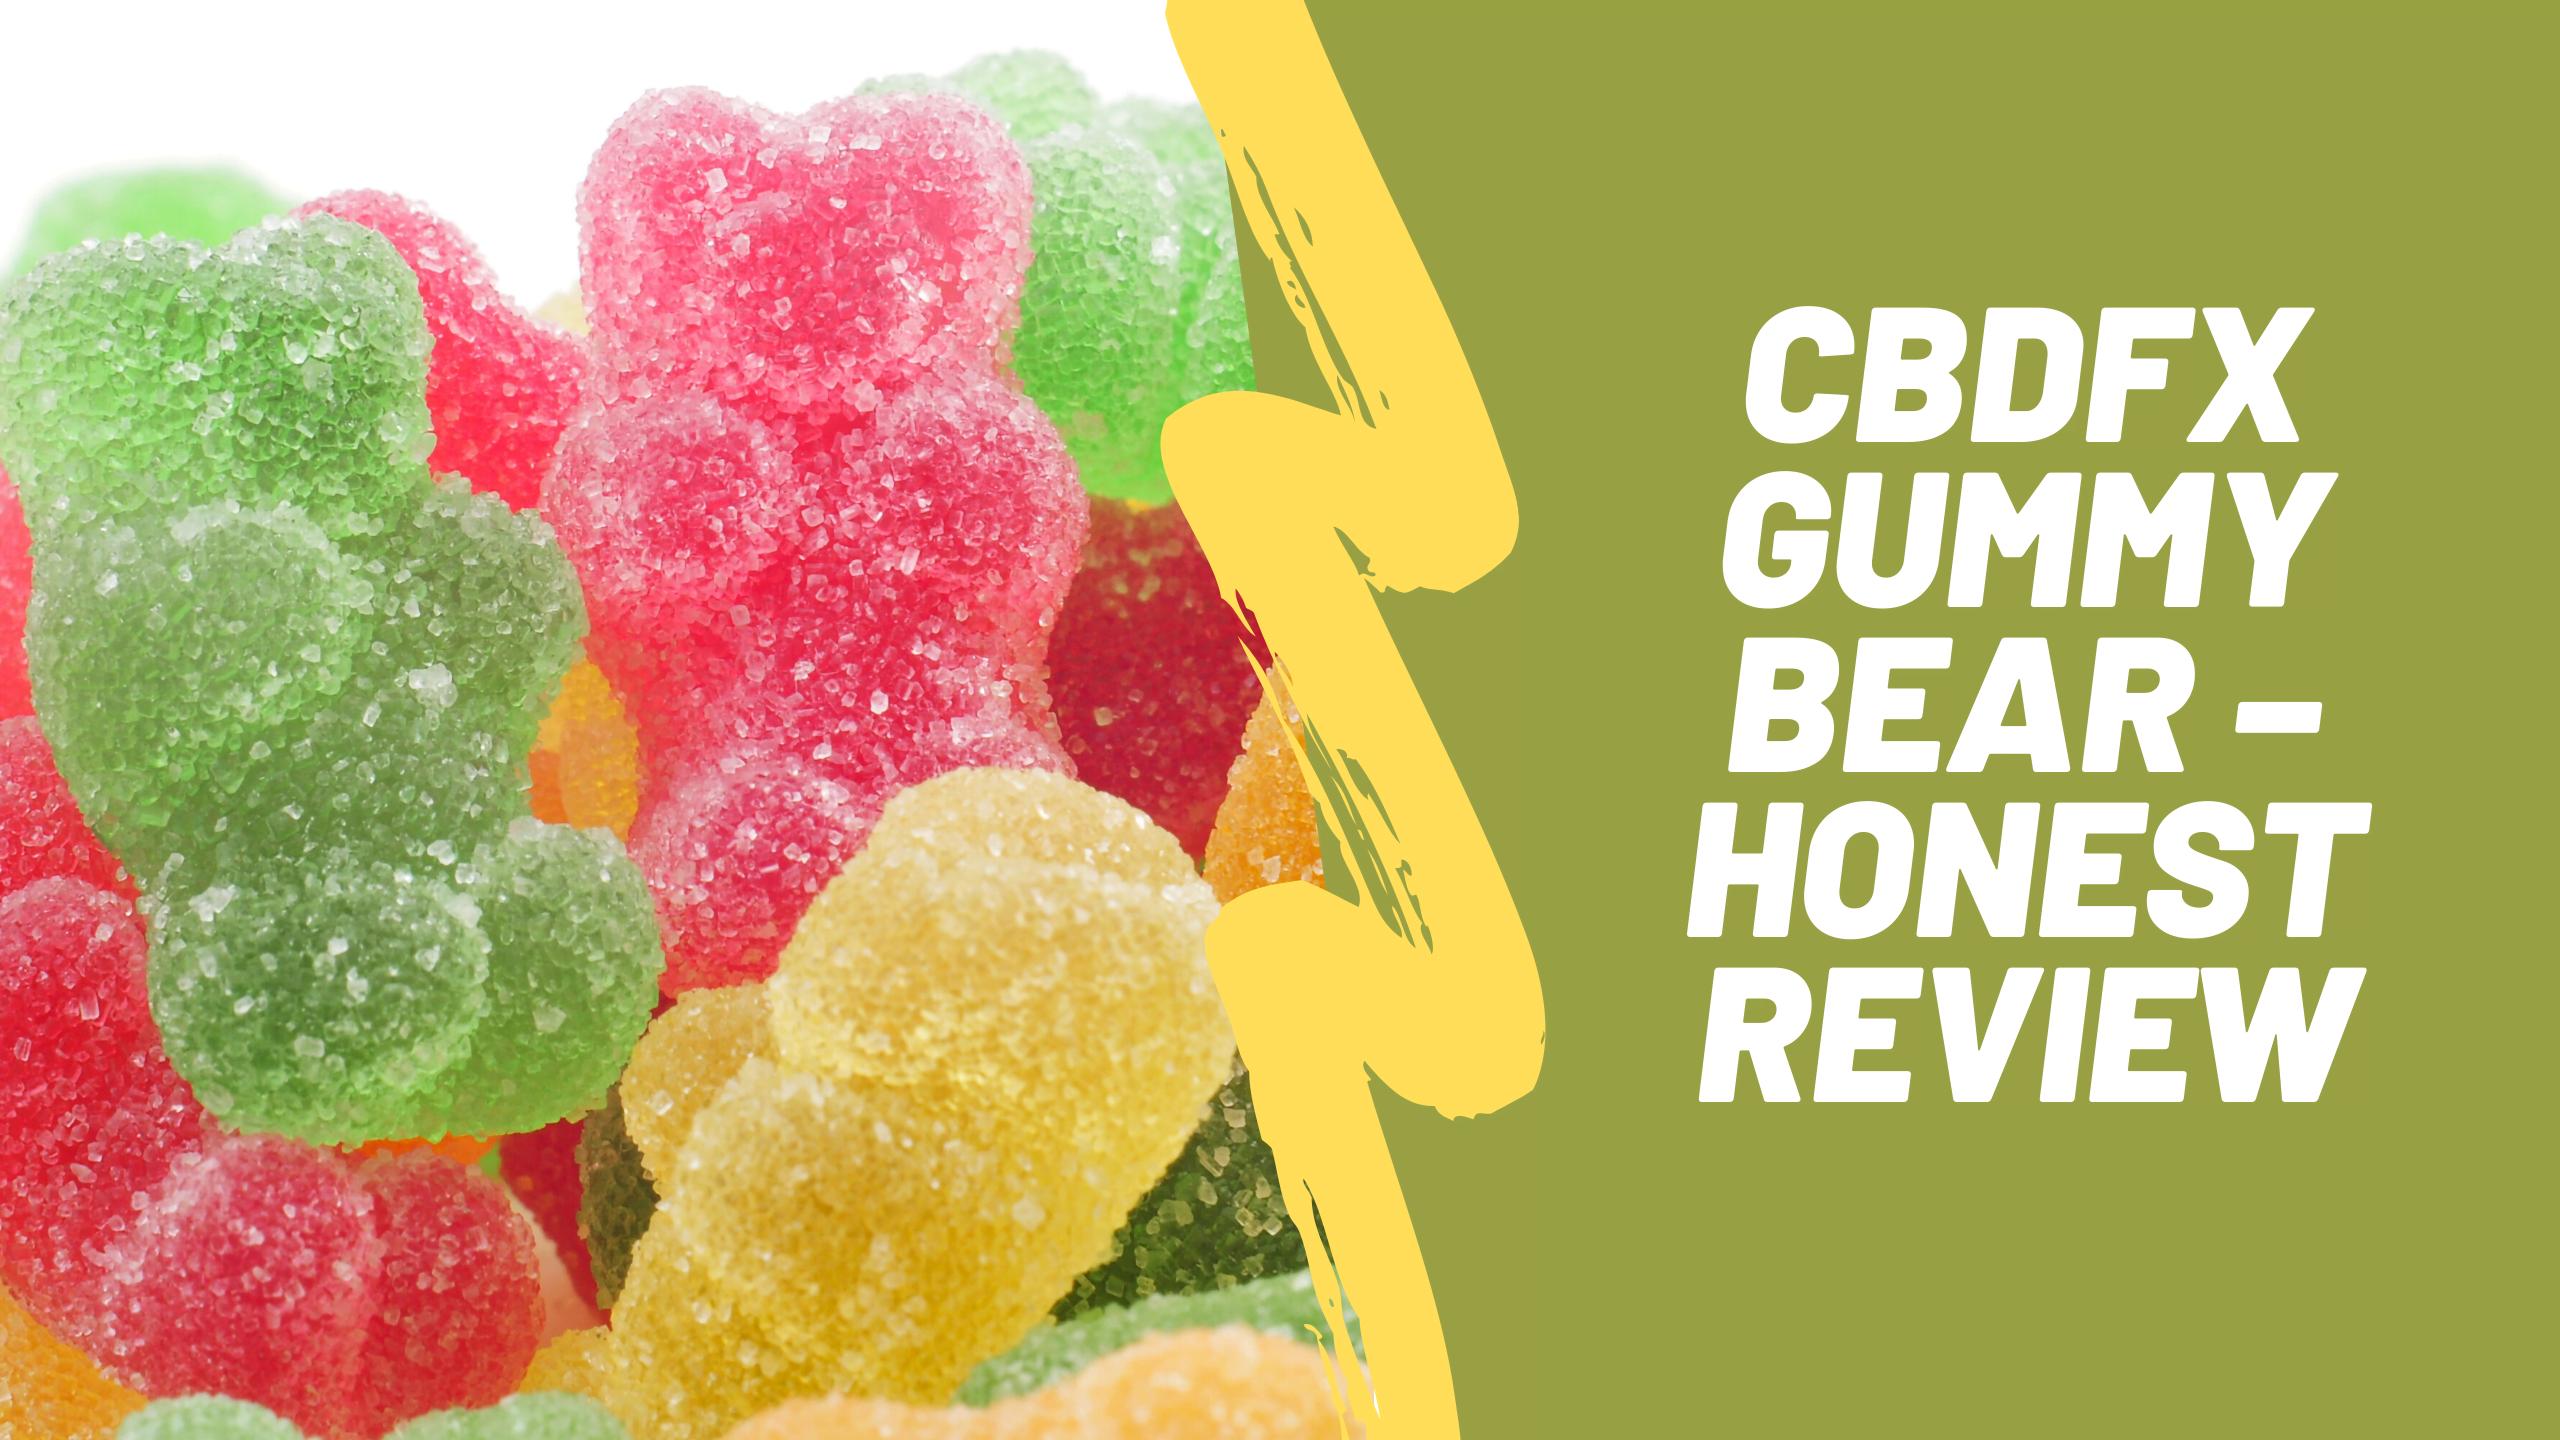 CBDfx Gummy Bear – Honest Review